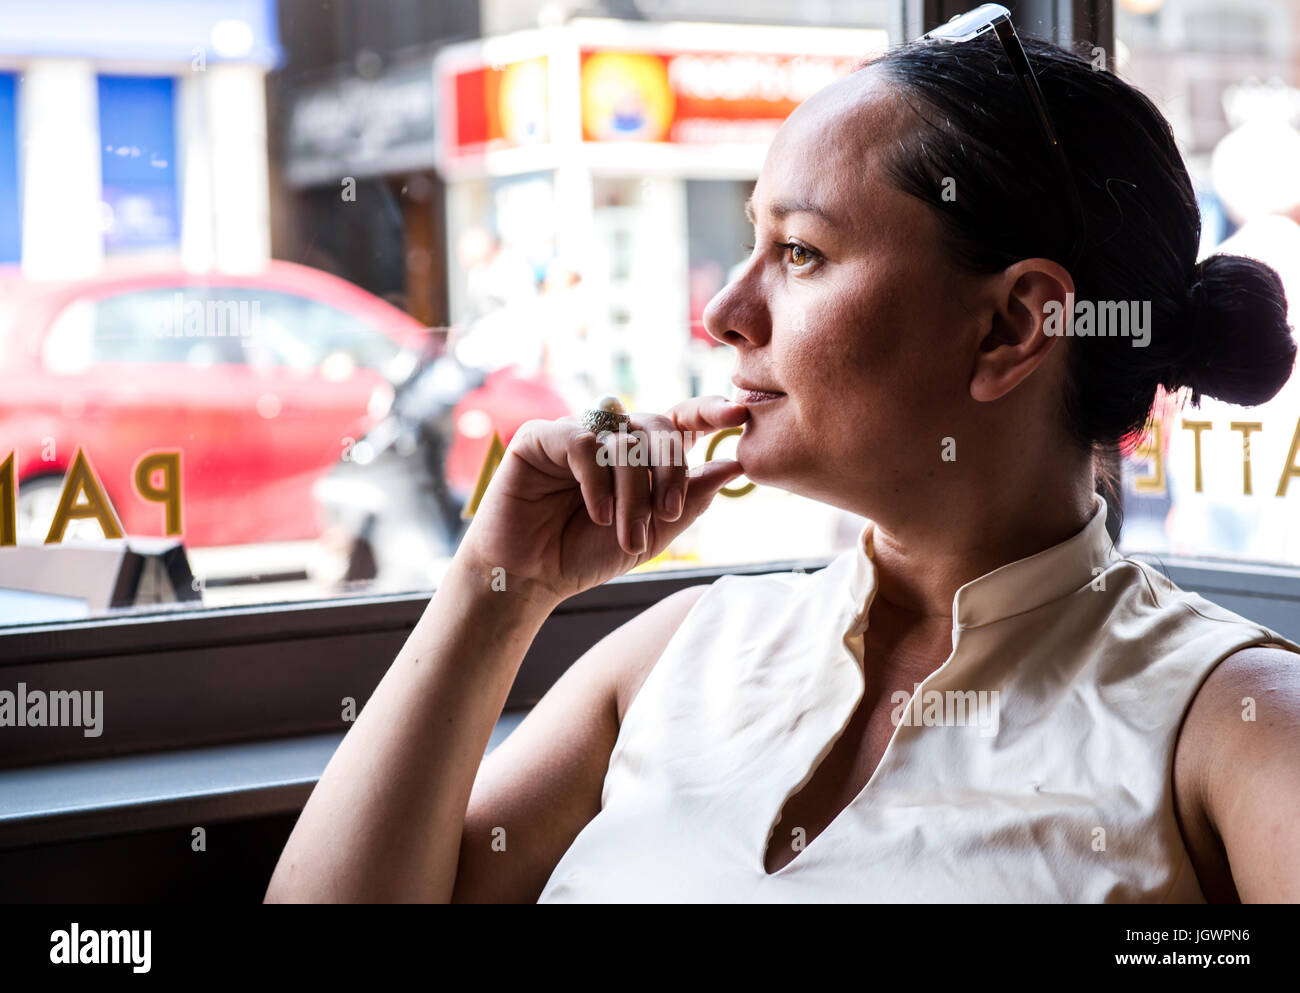 Businesswoman with hand on chin dans le café bar Photo Stock